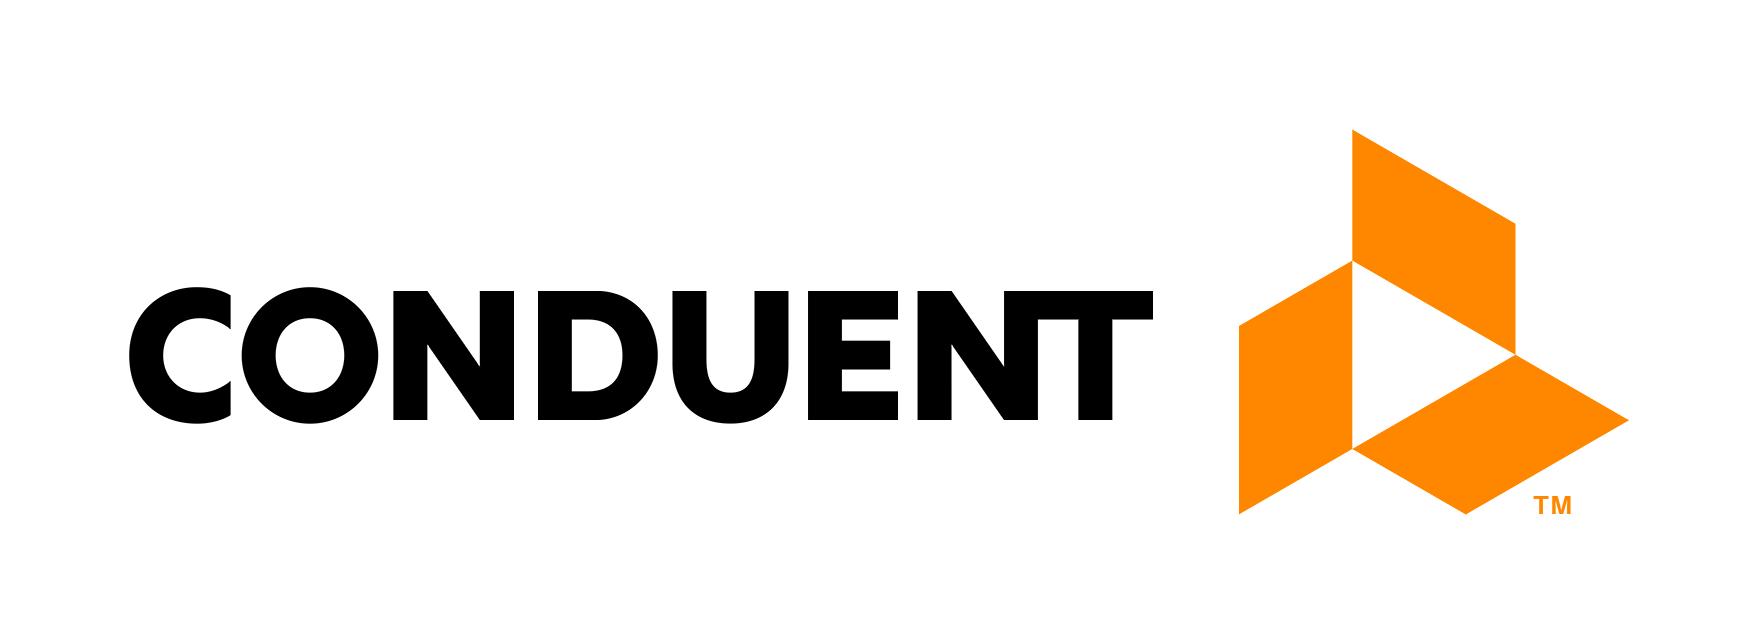 Conduent, Inc.